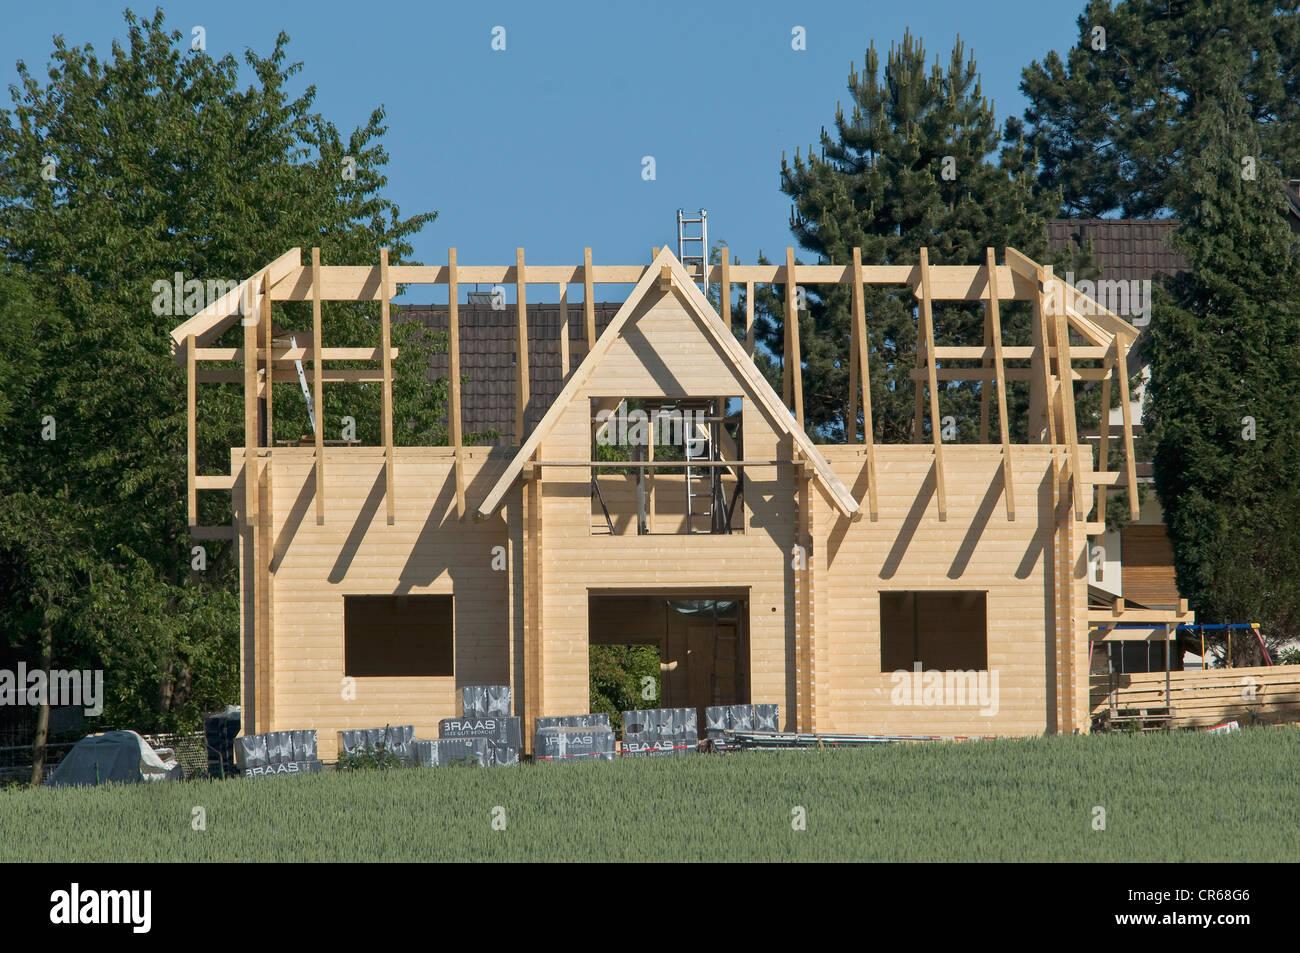 Neubau, Holzhaus, Dach im Bau, PublicGround Stockbild